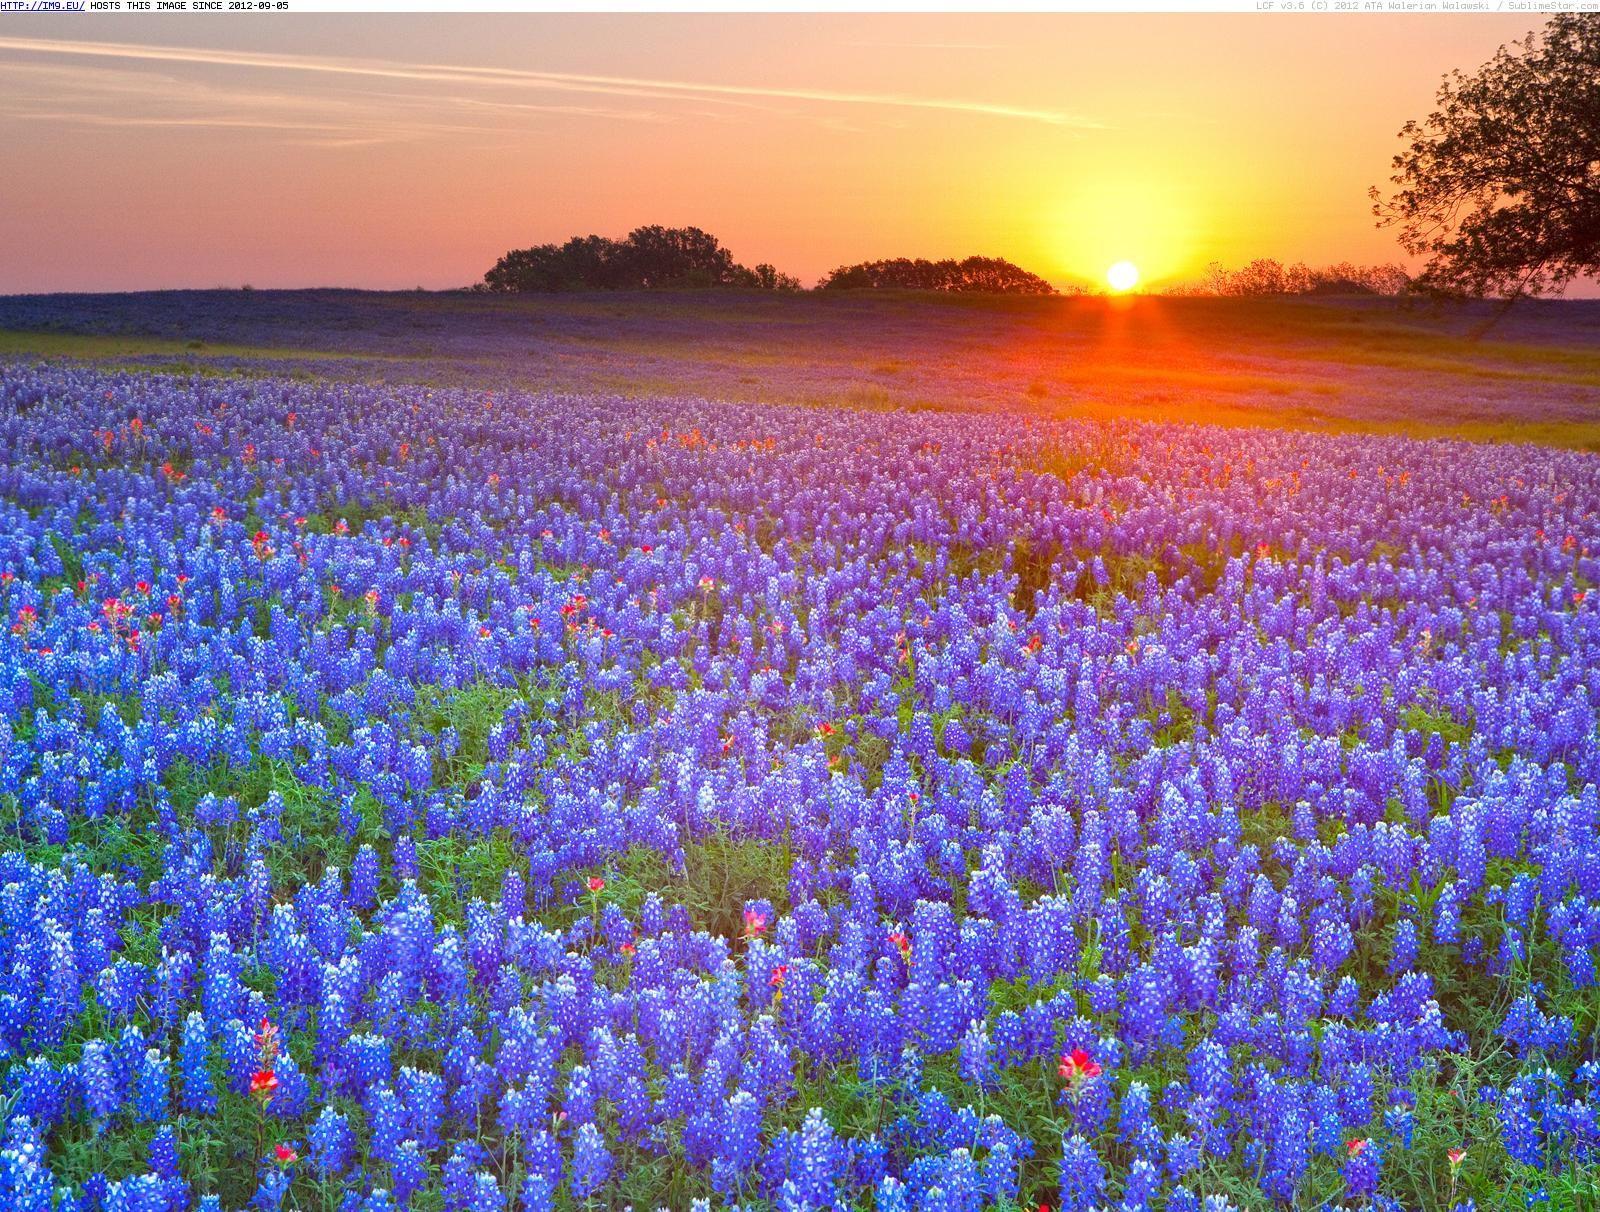 Bluebonnet Iphone Wallpaper Texas Bluebonnets Texas Hill Country Texas Your Hd